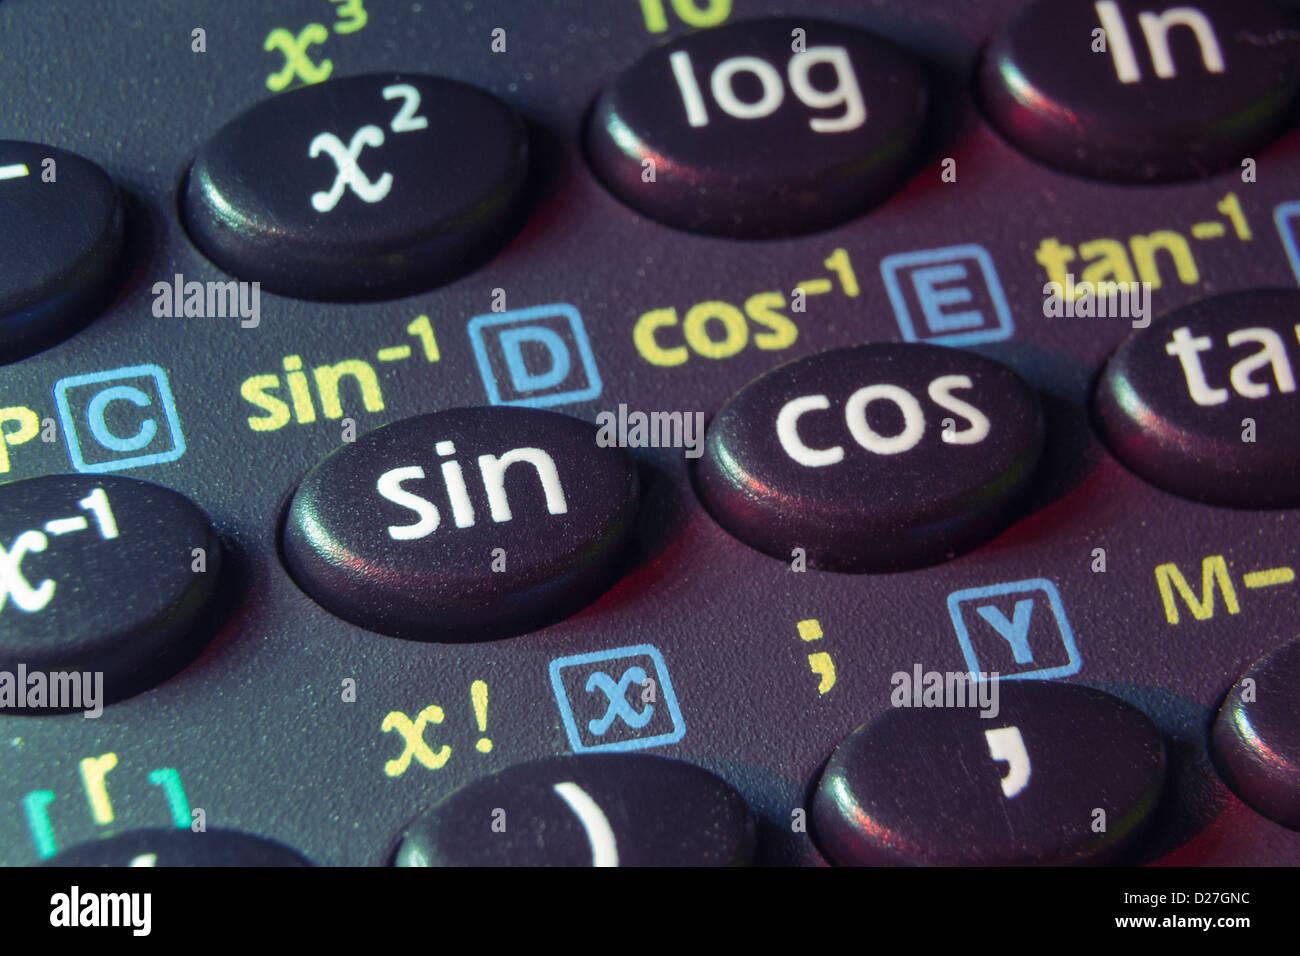 Trigonometry Stock Photos & Trigonometry Stock Images - Alamy